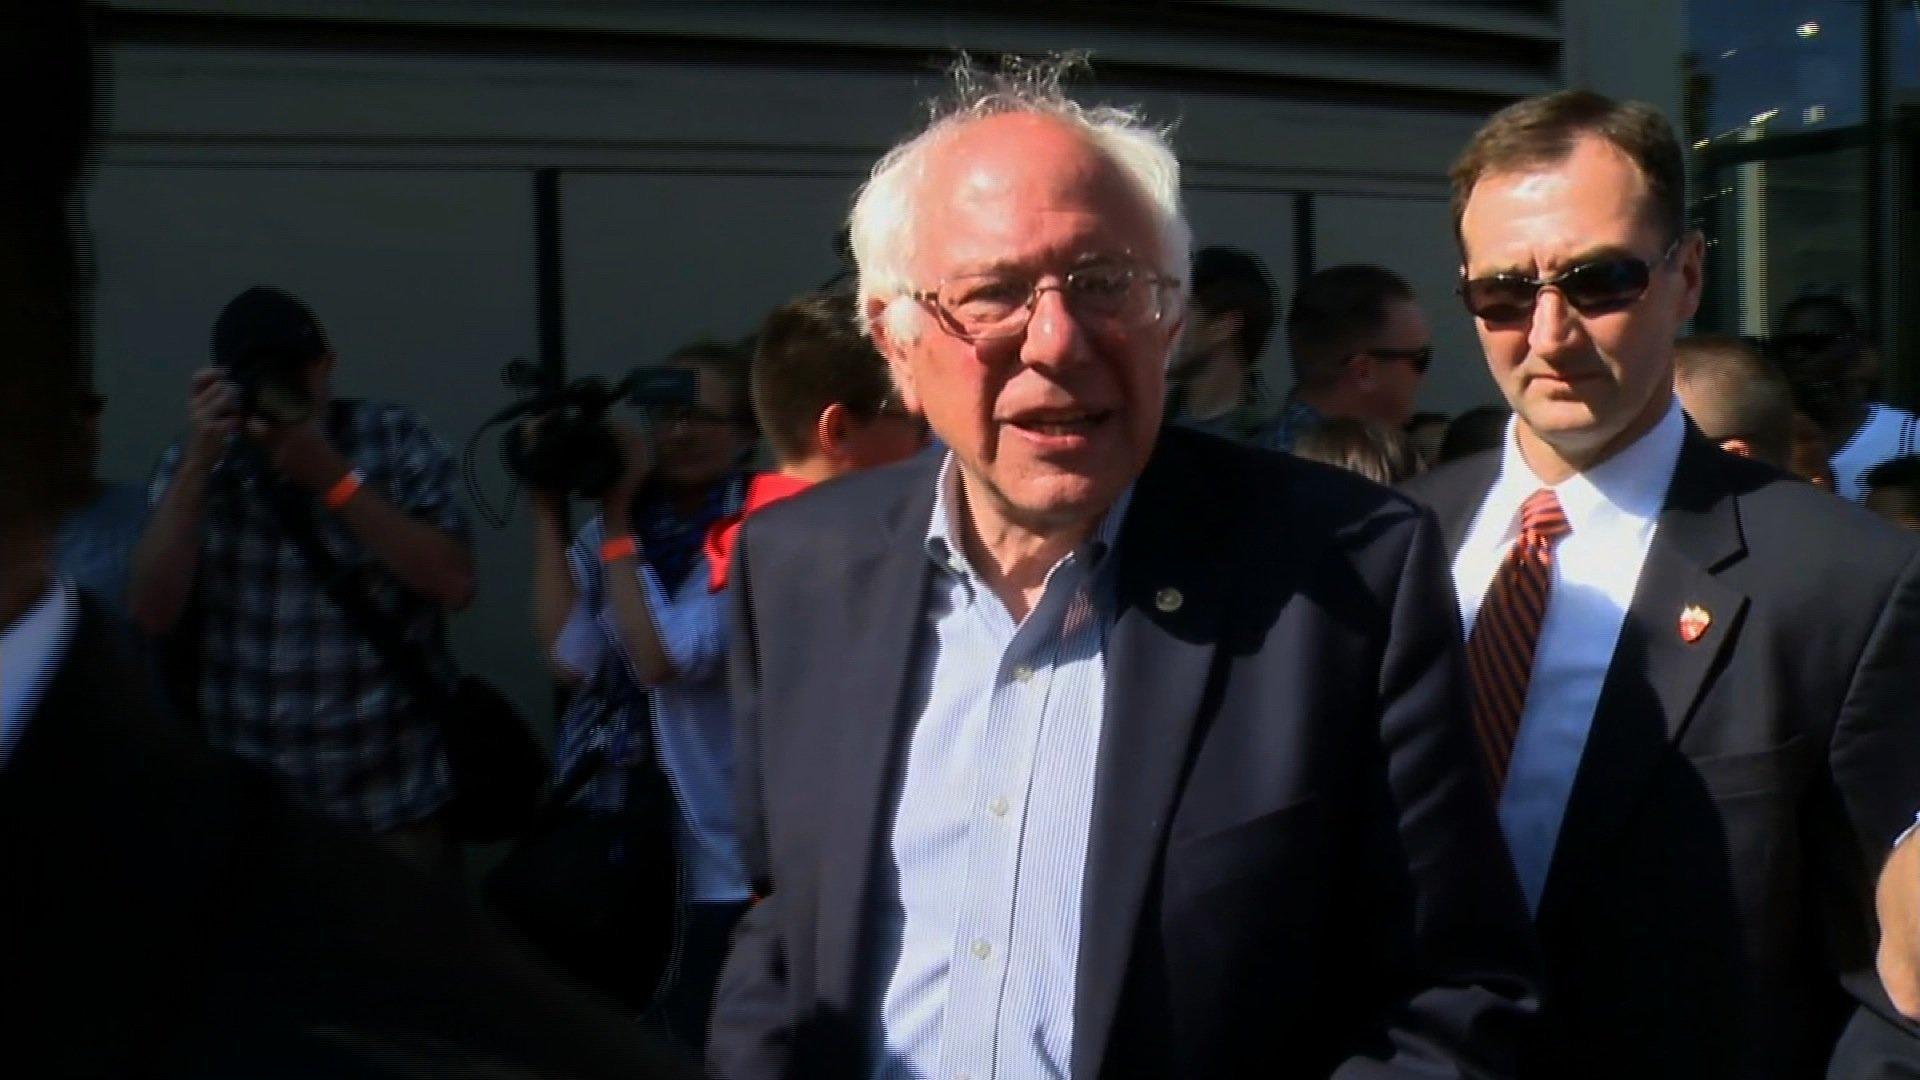 Democratic presidential candidate Bernie Sanders makes a stop in Hollywood, California, on June 7, 2016. Credit: CNN